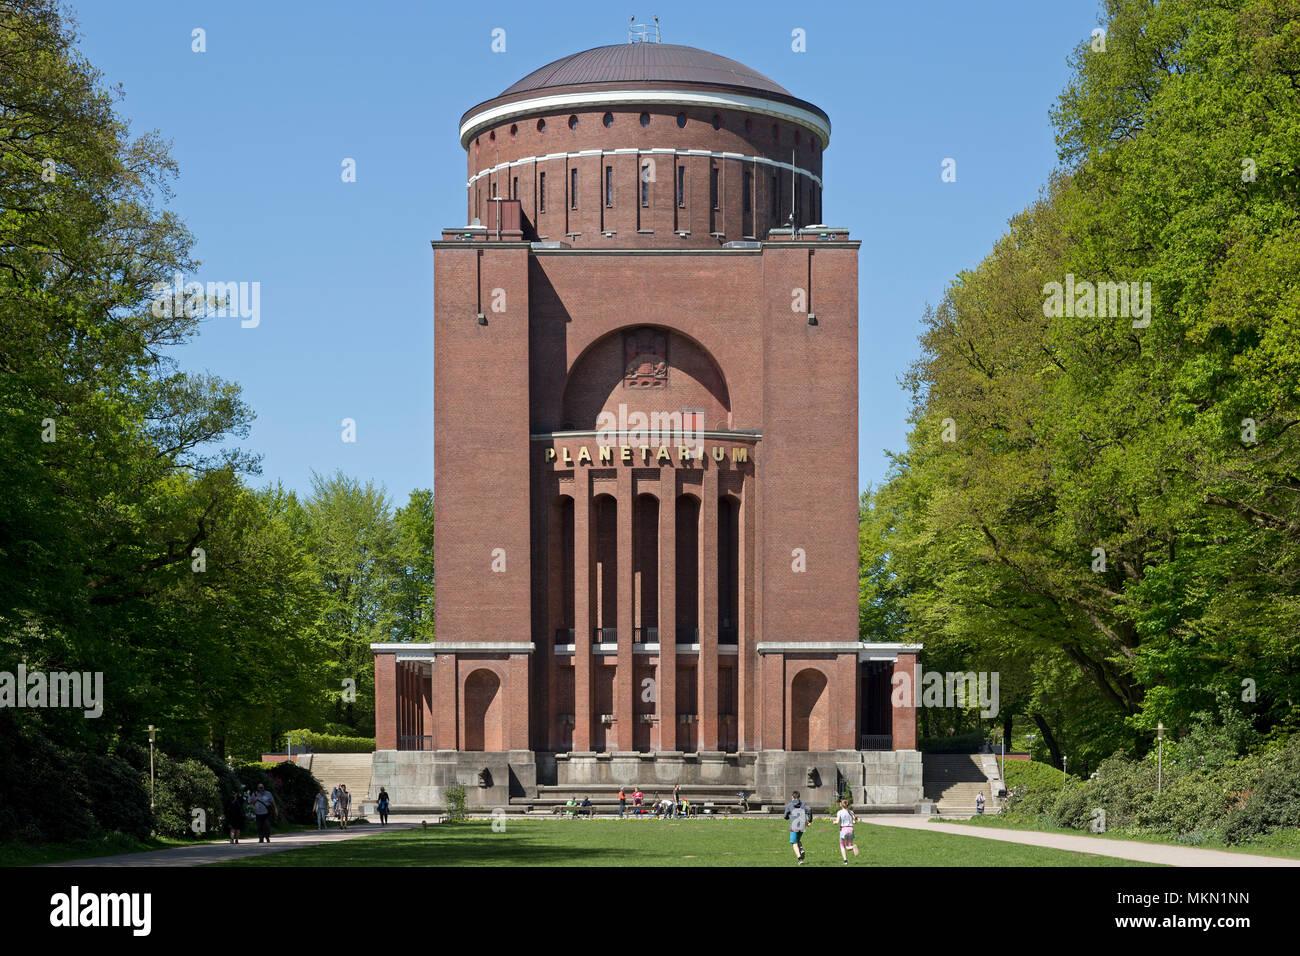 planetarium, Hamburg, Germany - Stock Image